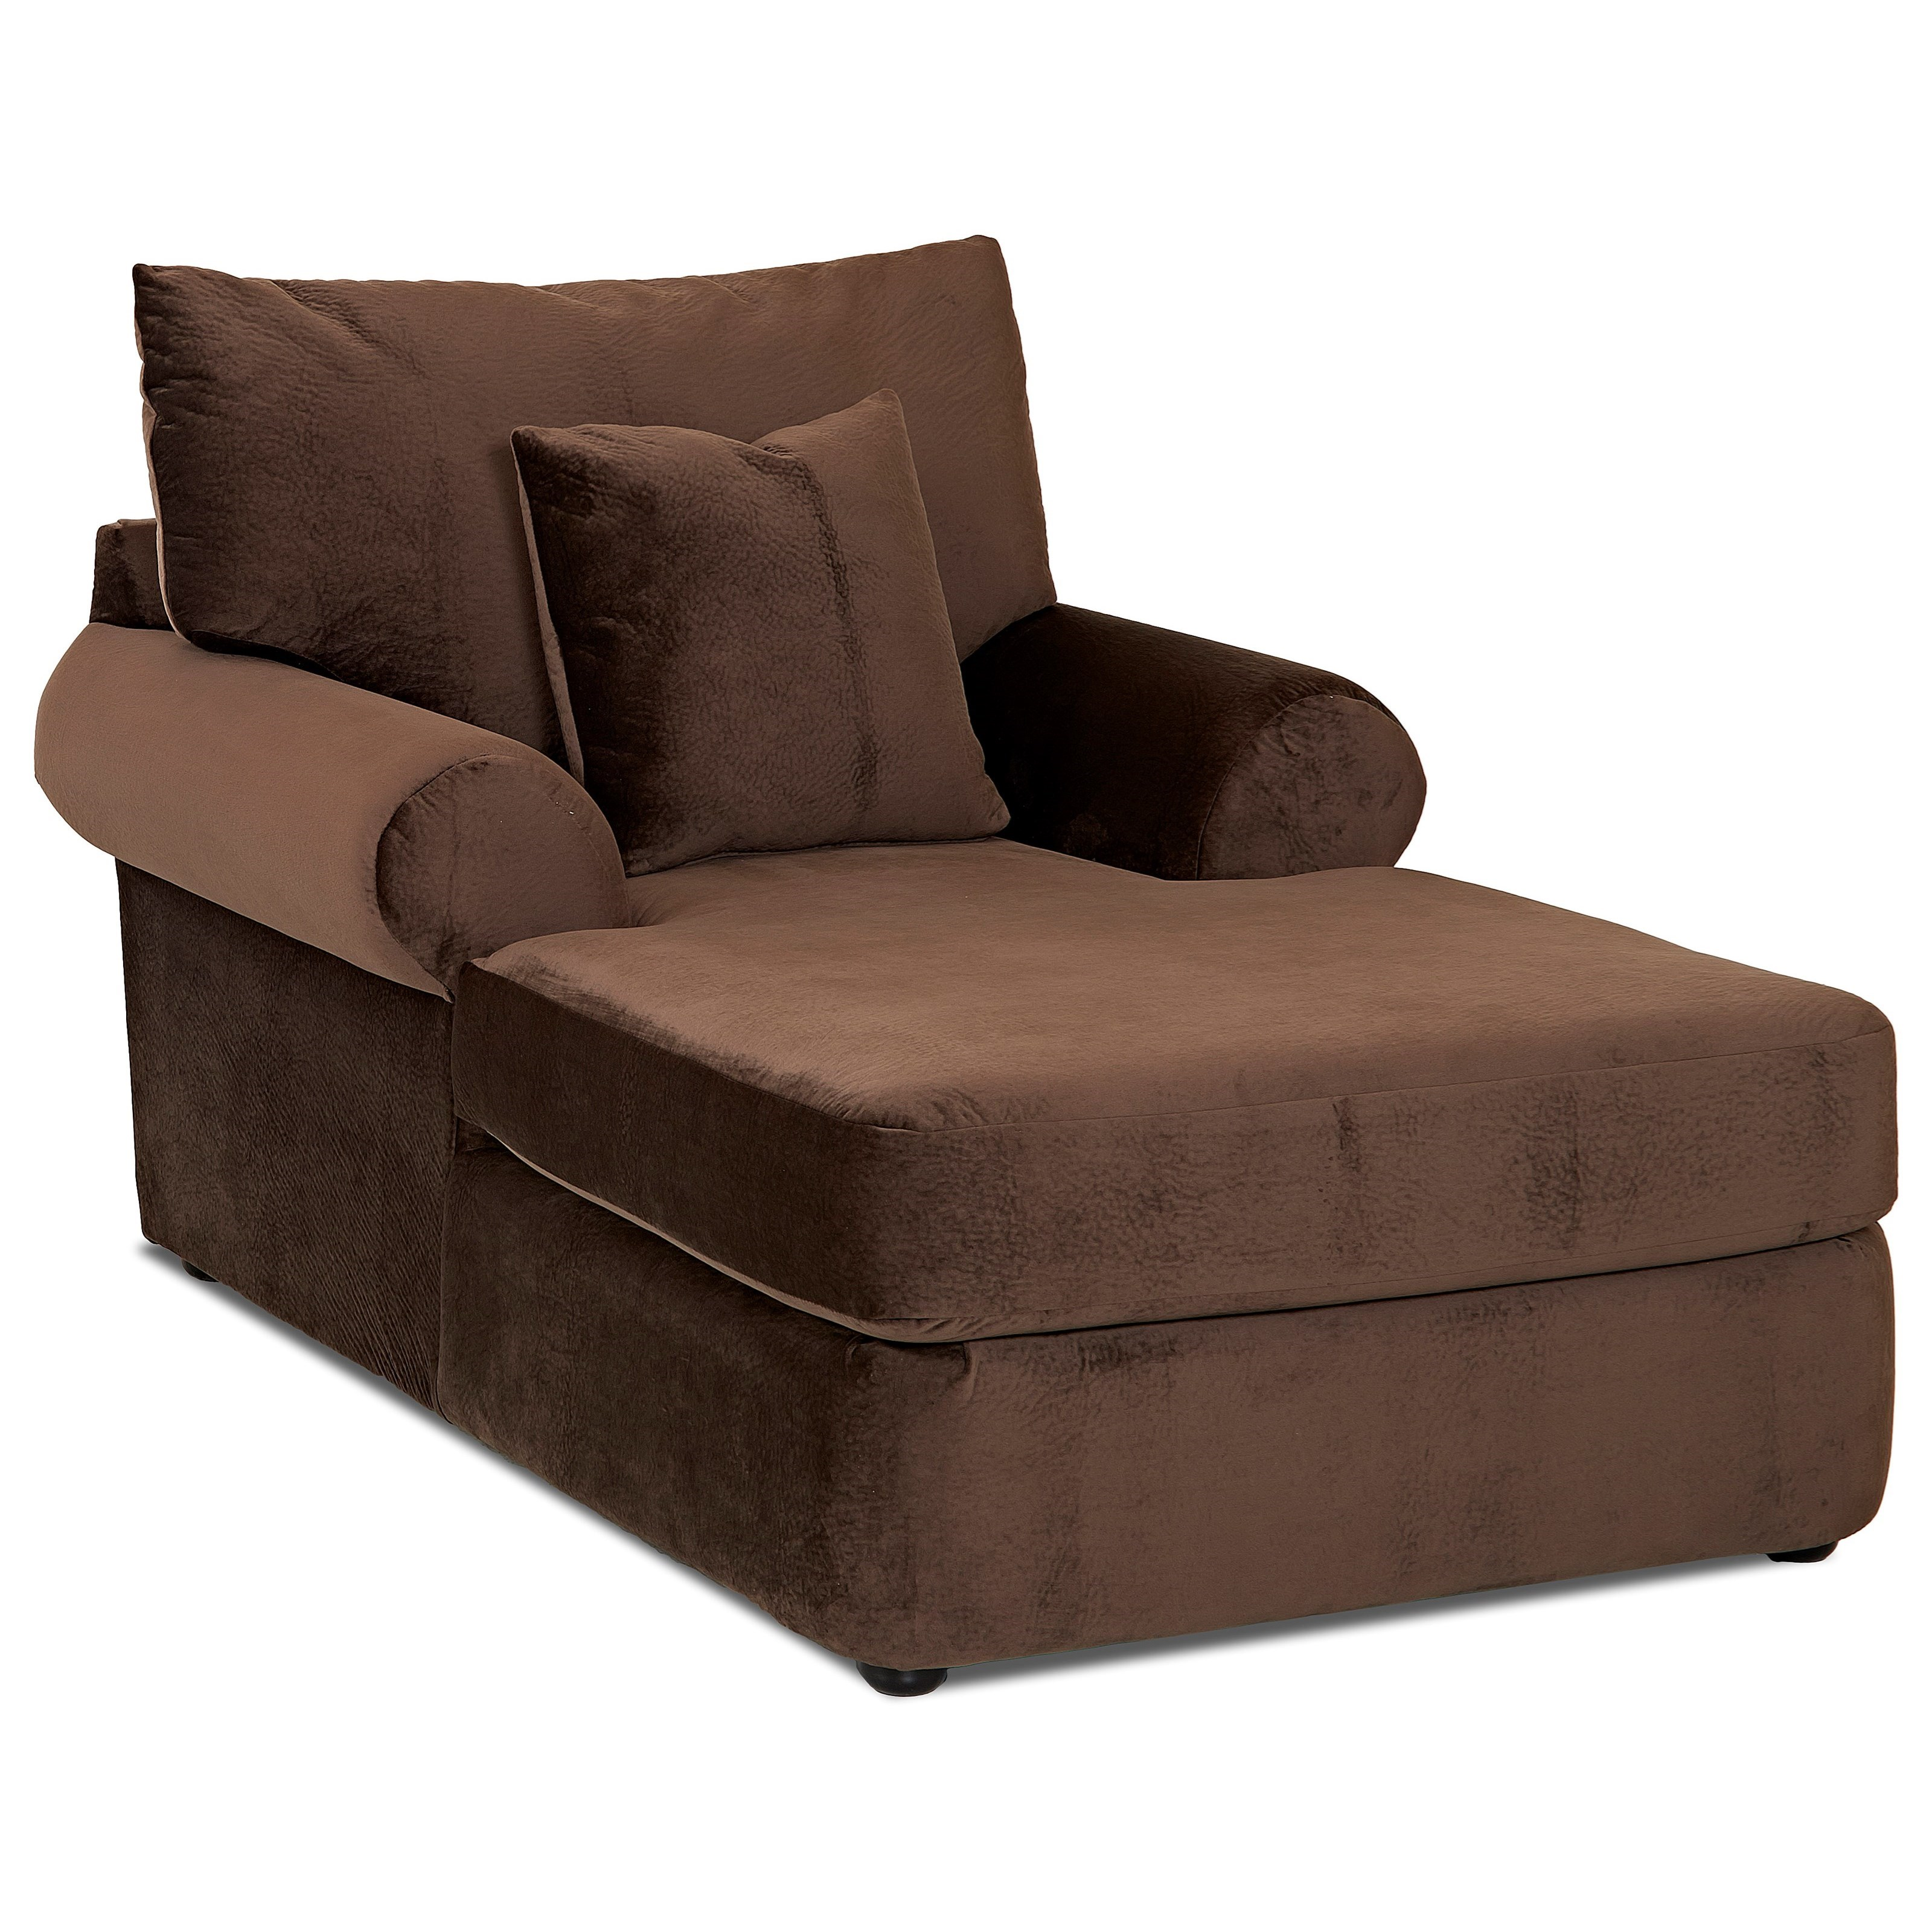 Casual Plush Chaise Lounge